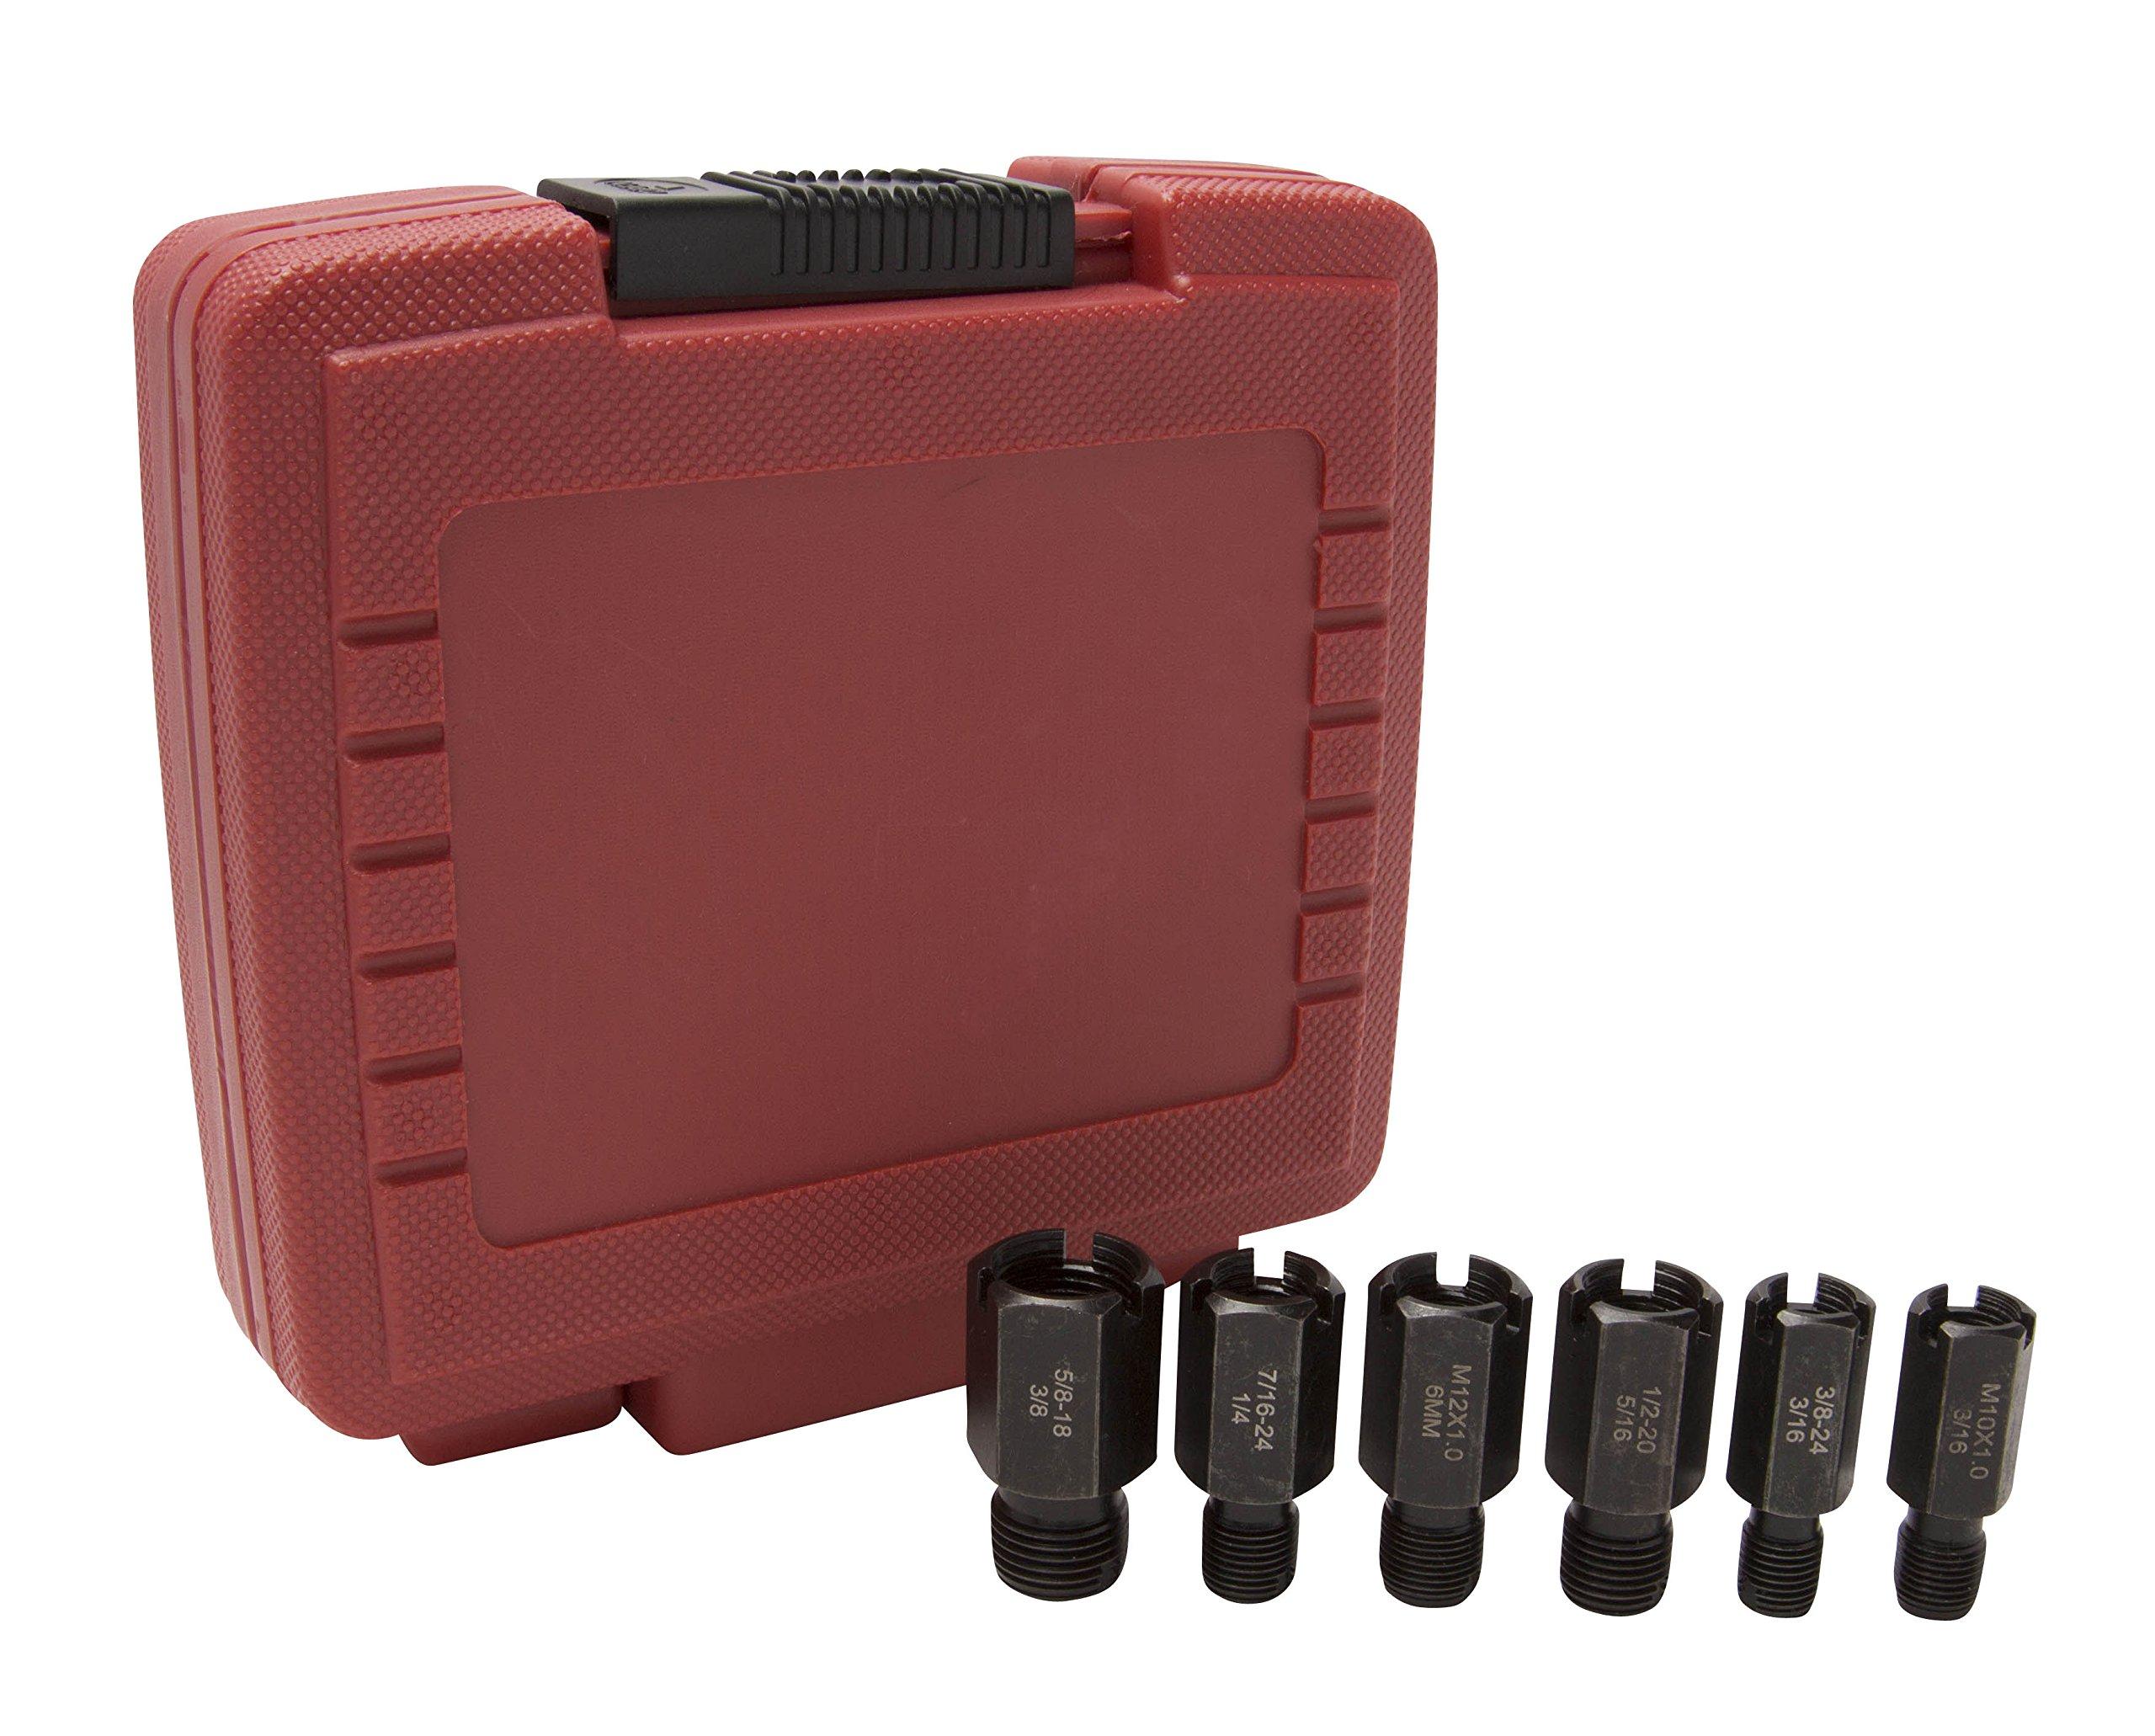 Steelman Lock Technology LT993 Brake Line/Cylinder Re-Threading Kit by Steelman (Image #3)